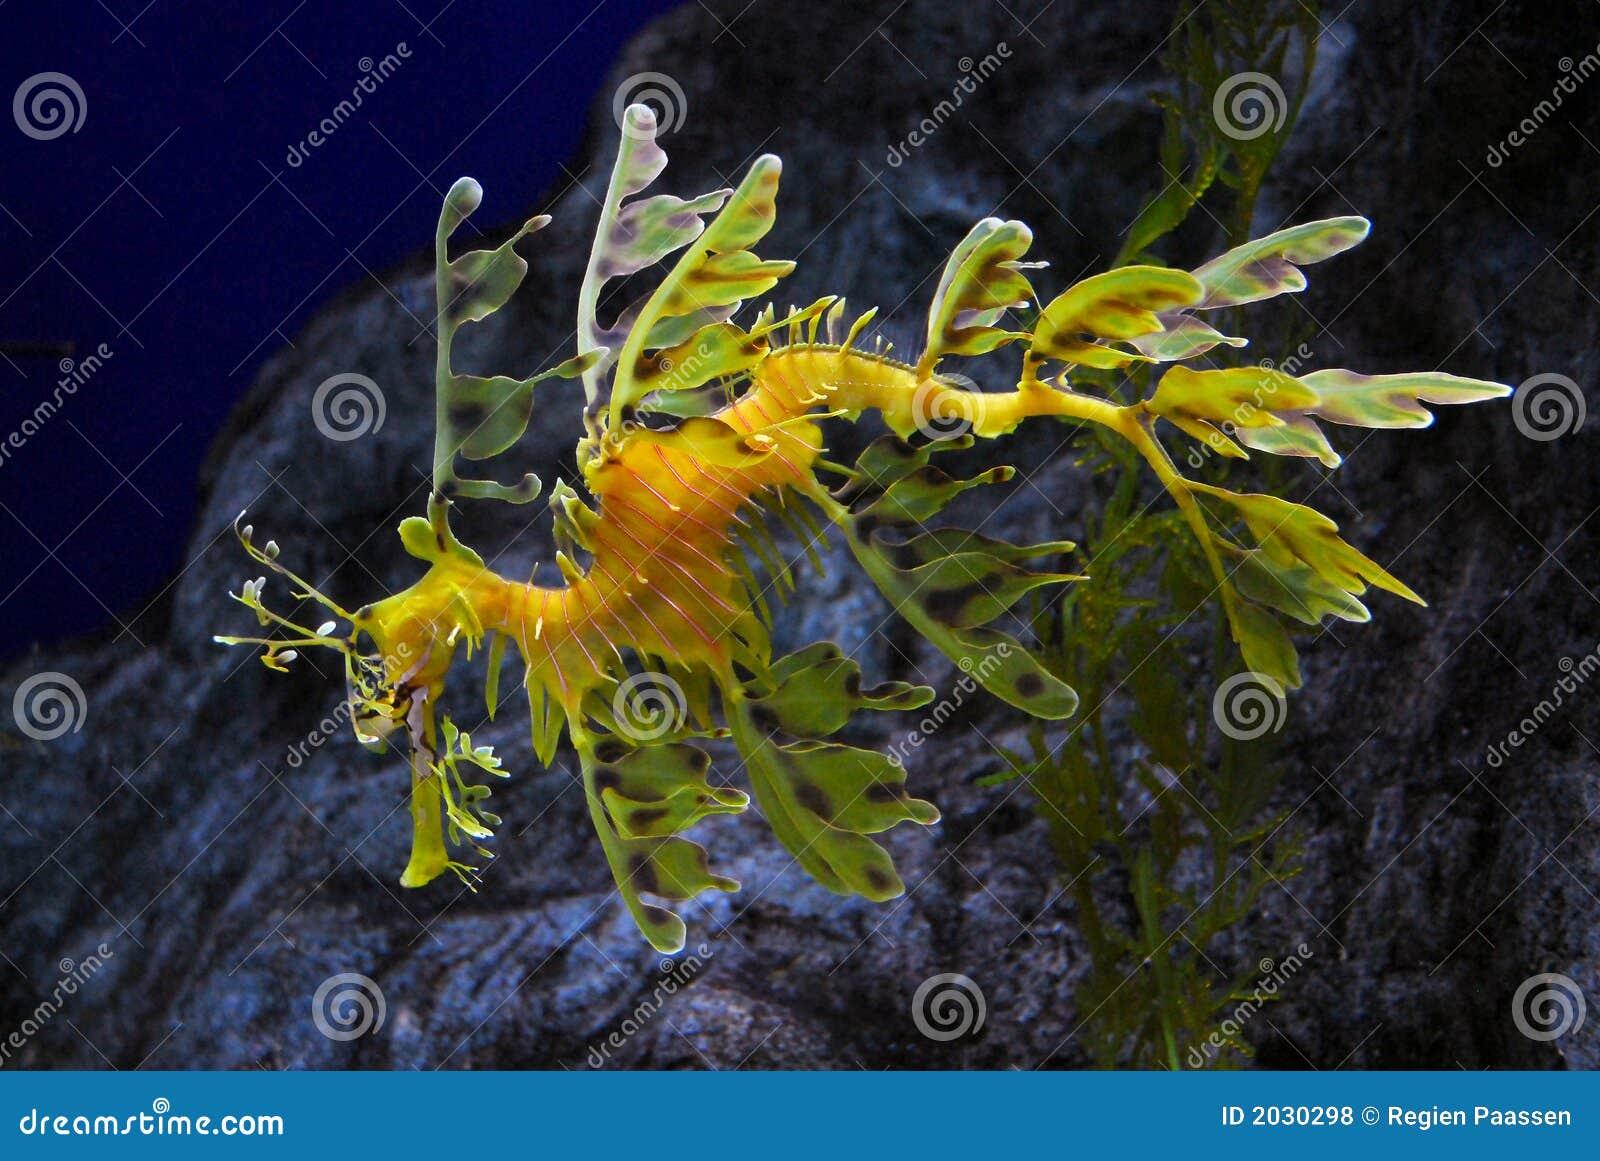 Seadragon feuillu